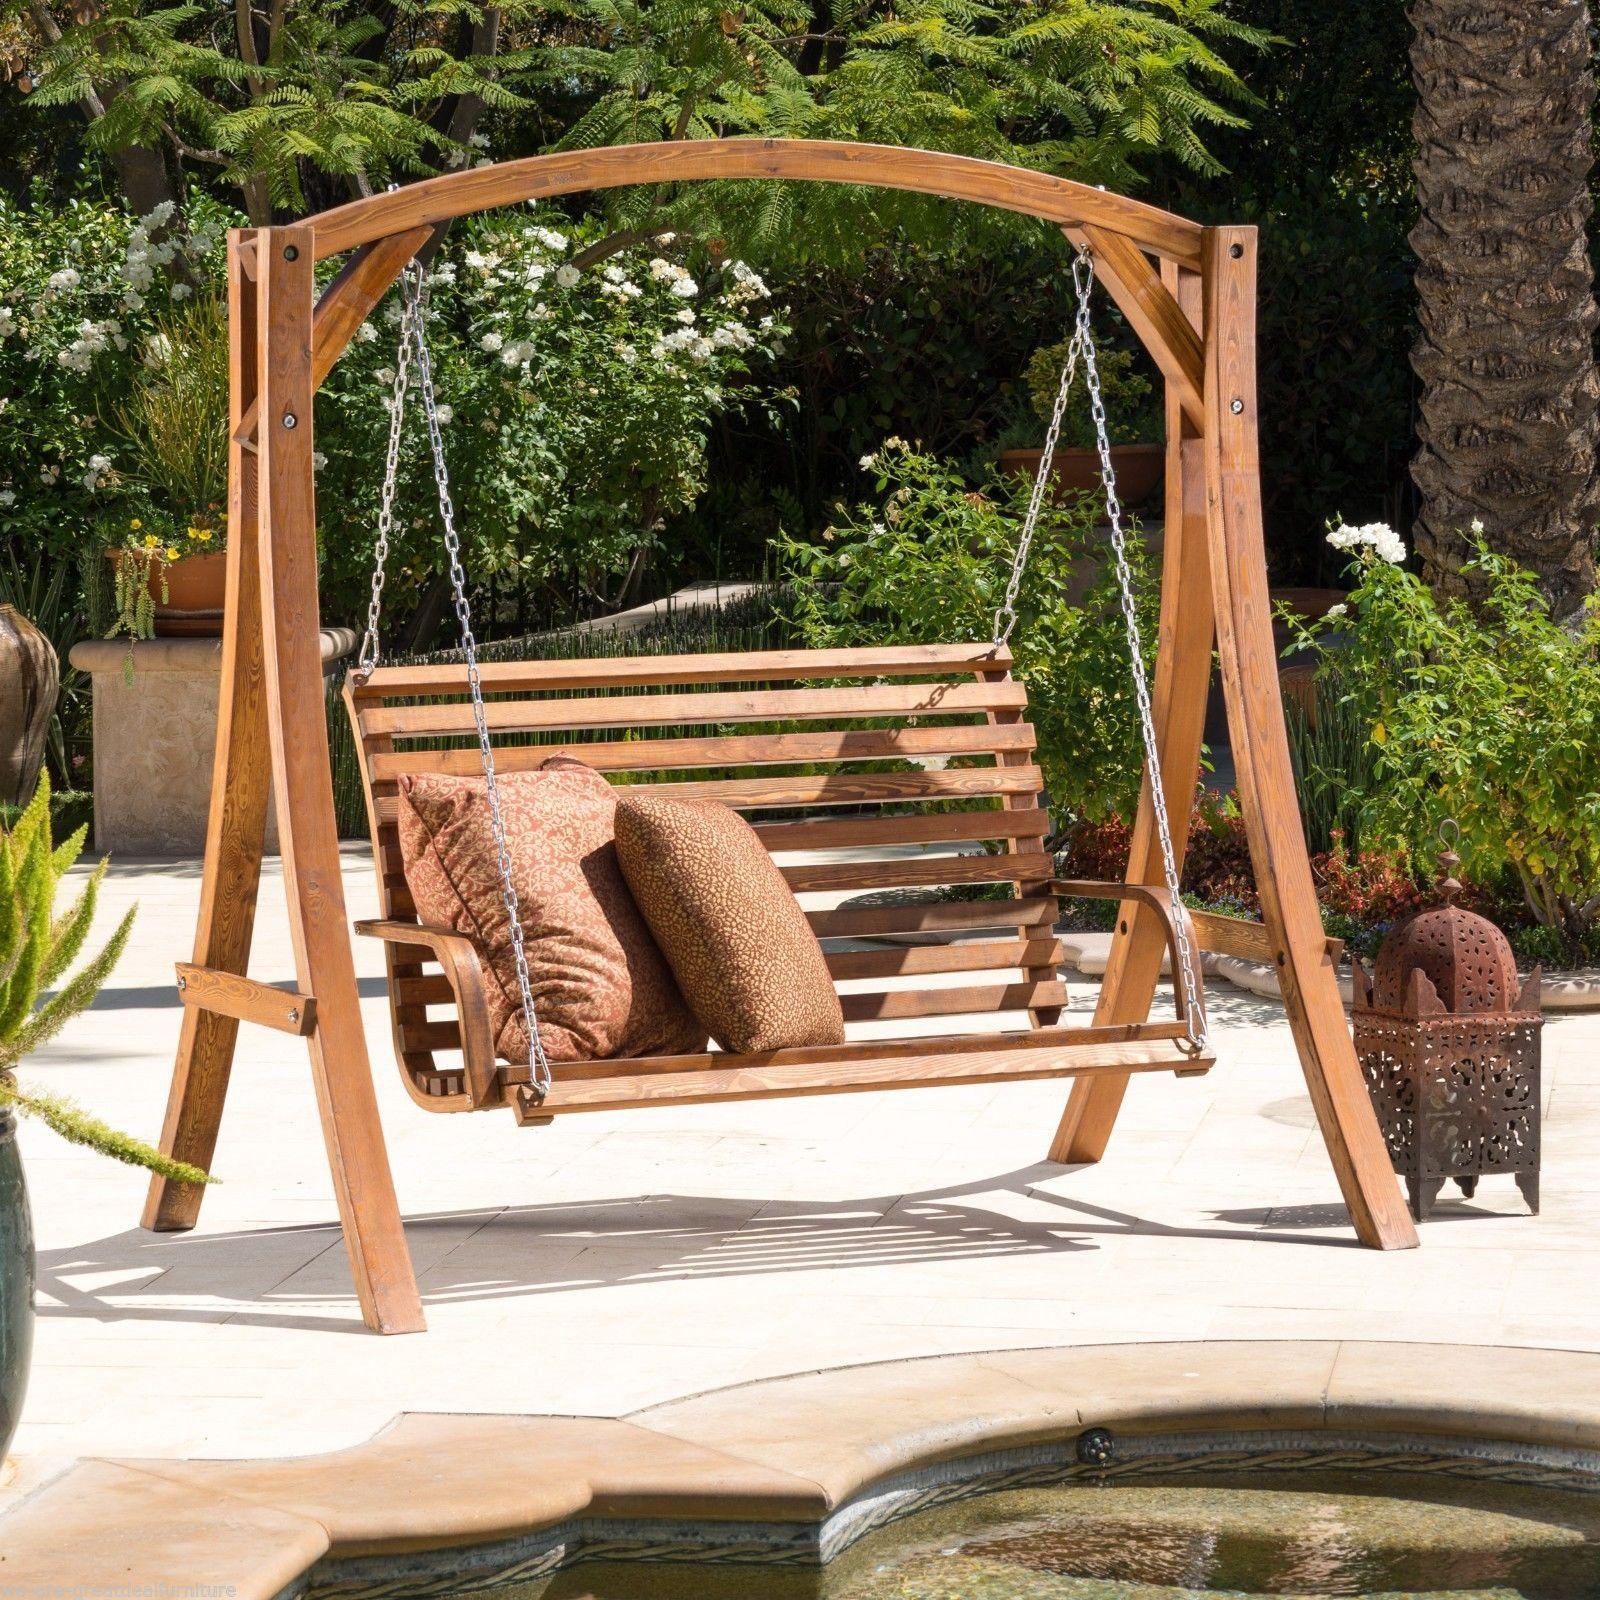 Acacia Wood Patio Swing Bench Swinging Bench Wood | ThePatioDepot.com USA